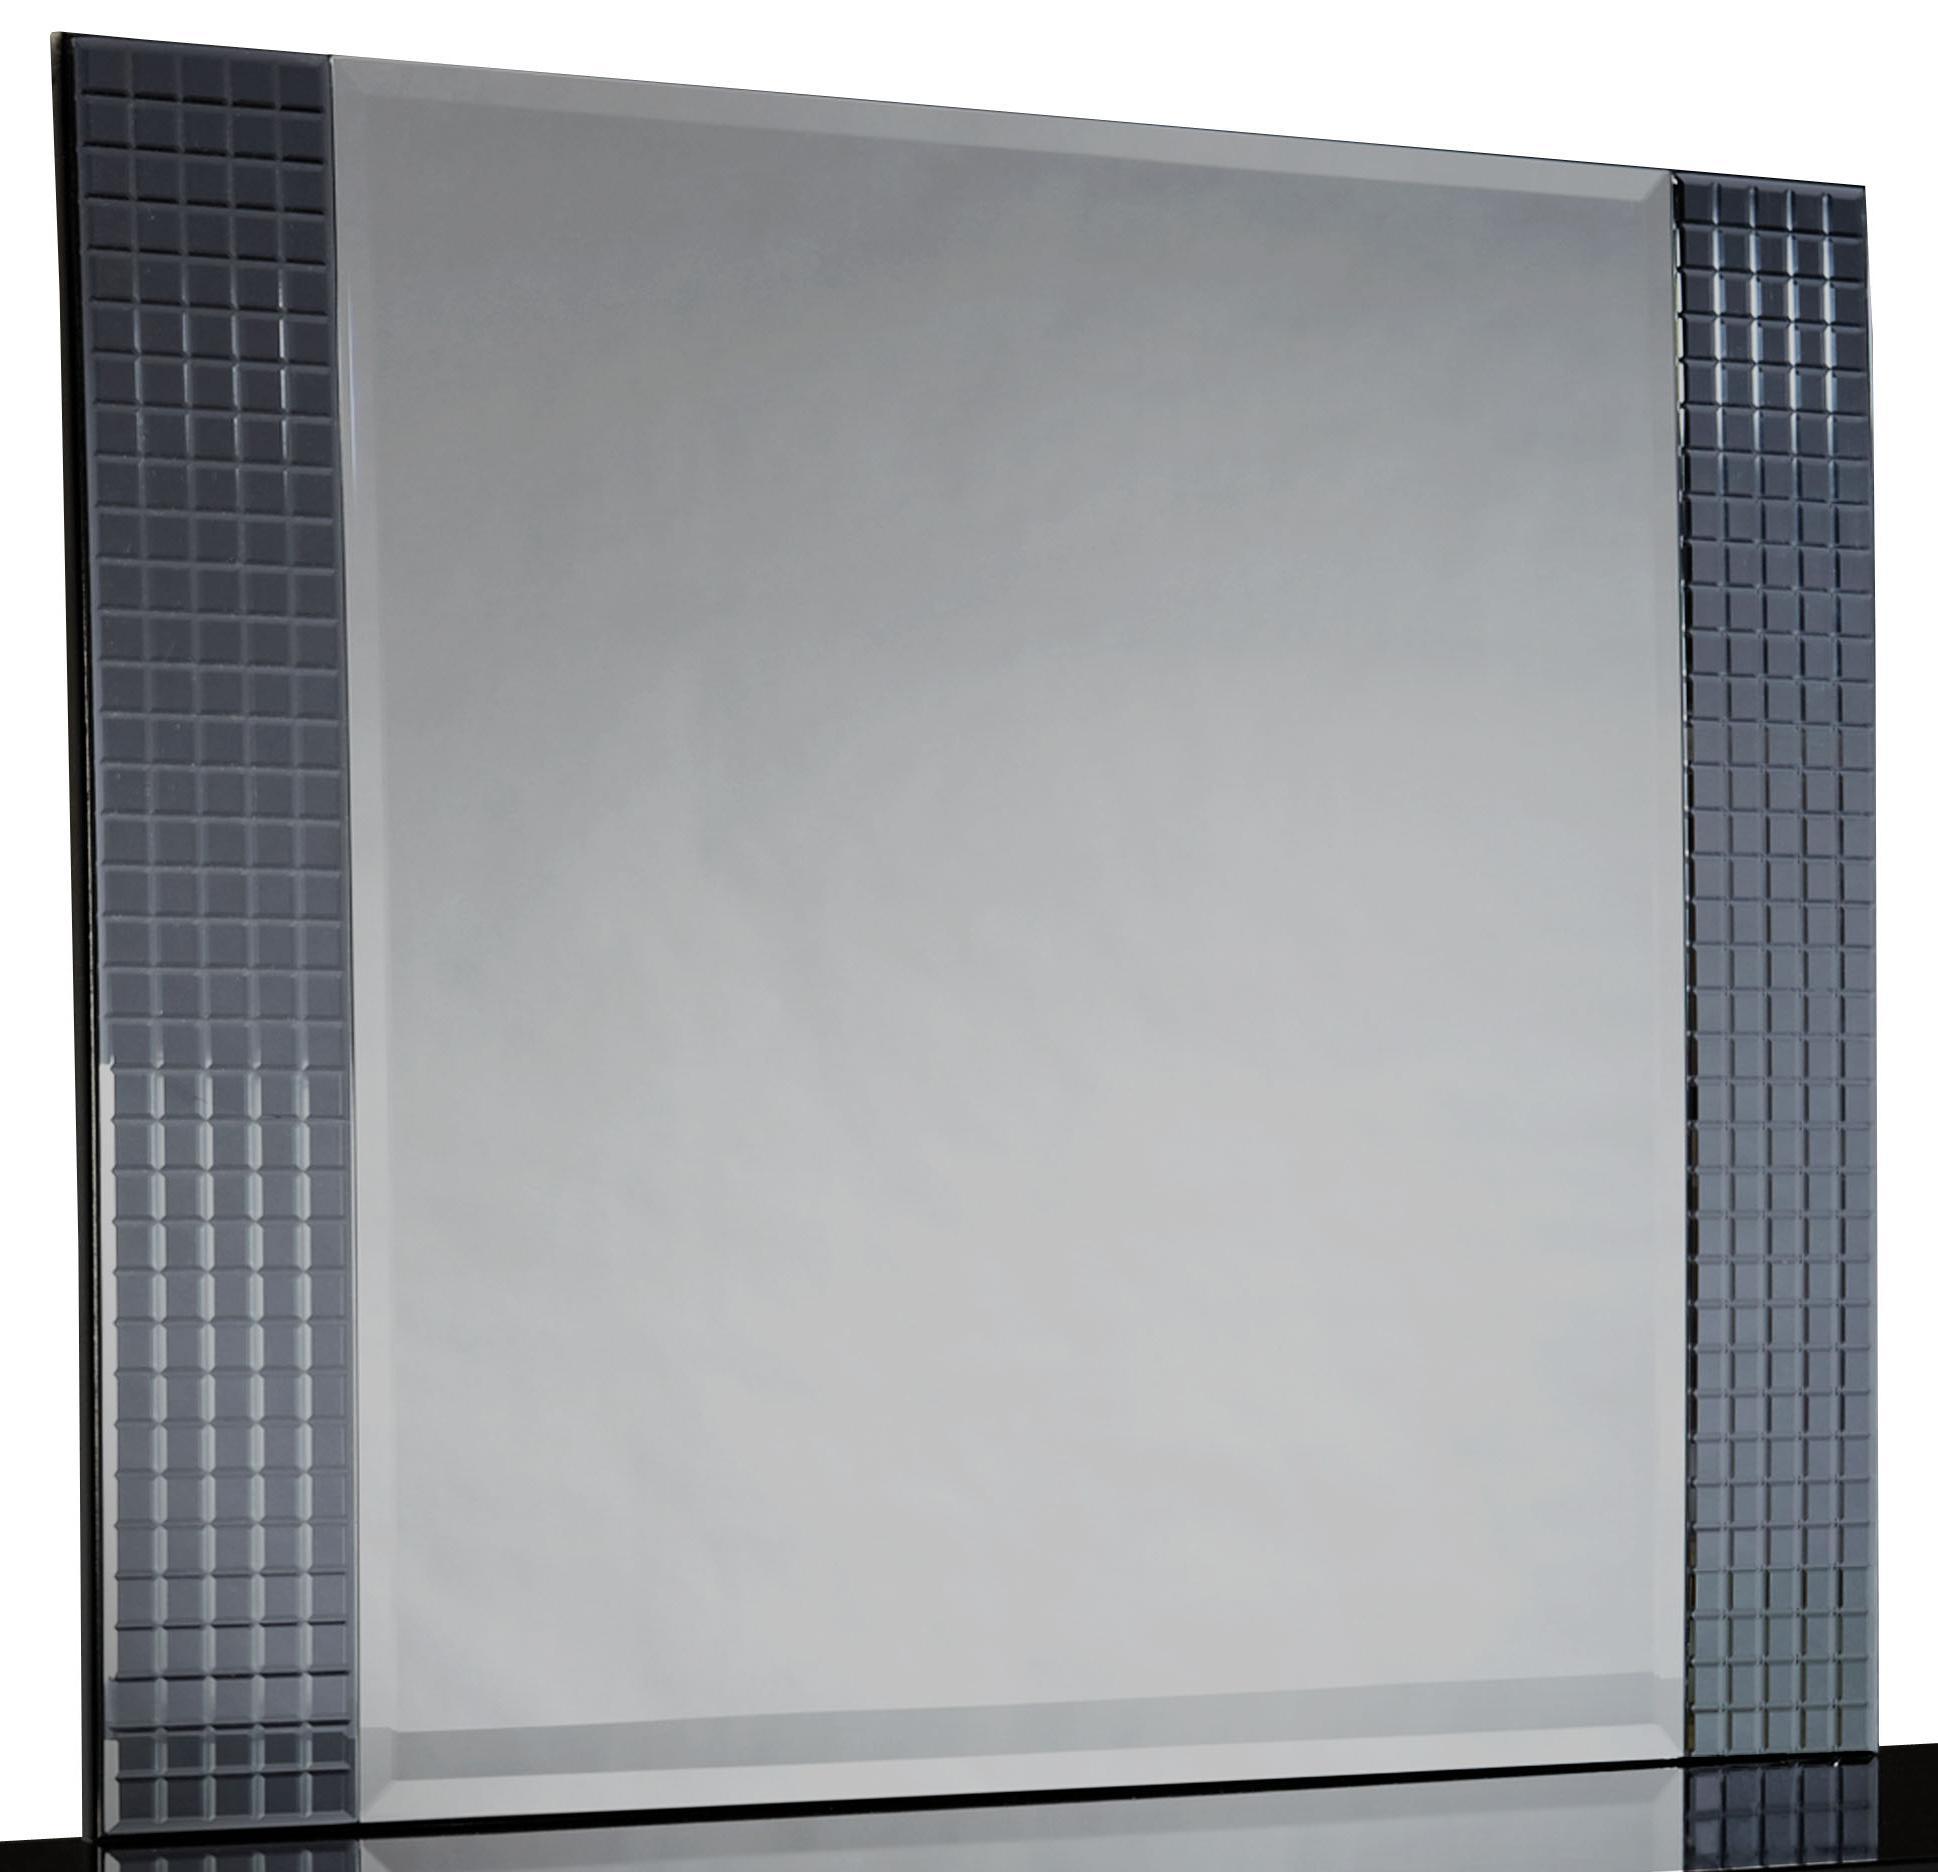 Standard Furniture Marilyn Youth Landscape Mirror - Item Number: 67318